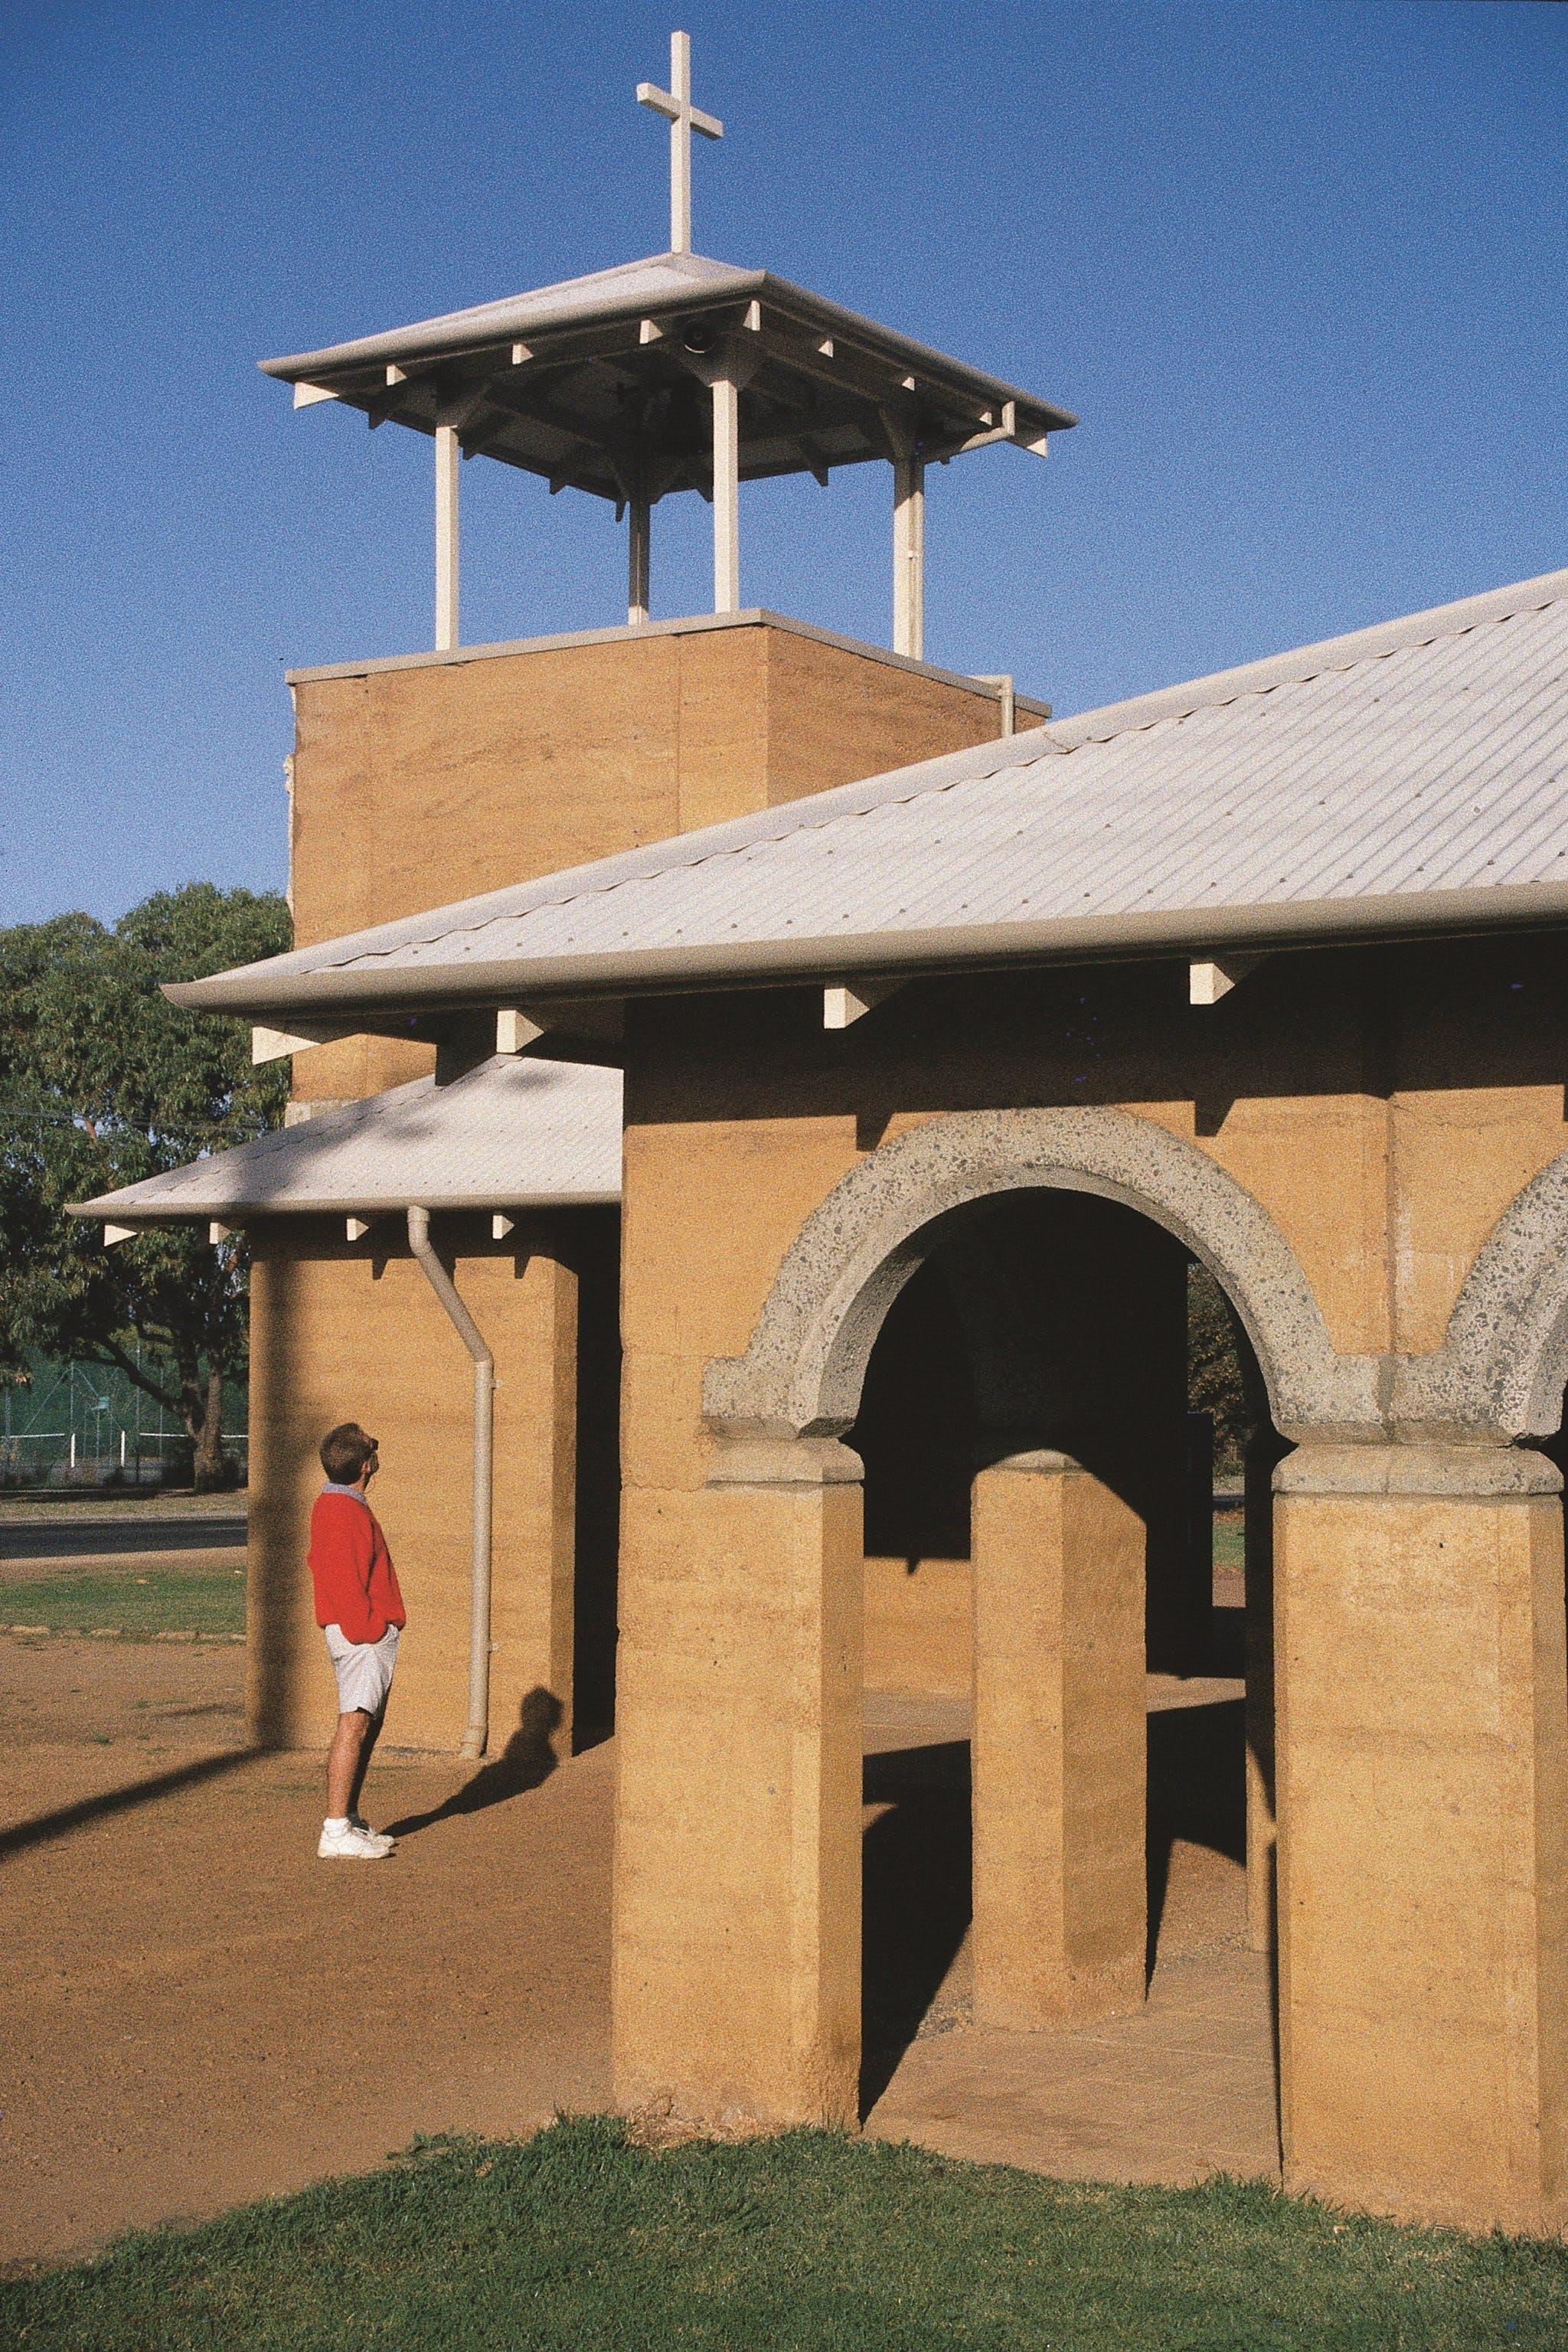 St Thomas More Catholic Church, Margaret River, Western Australia